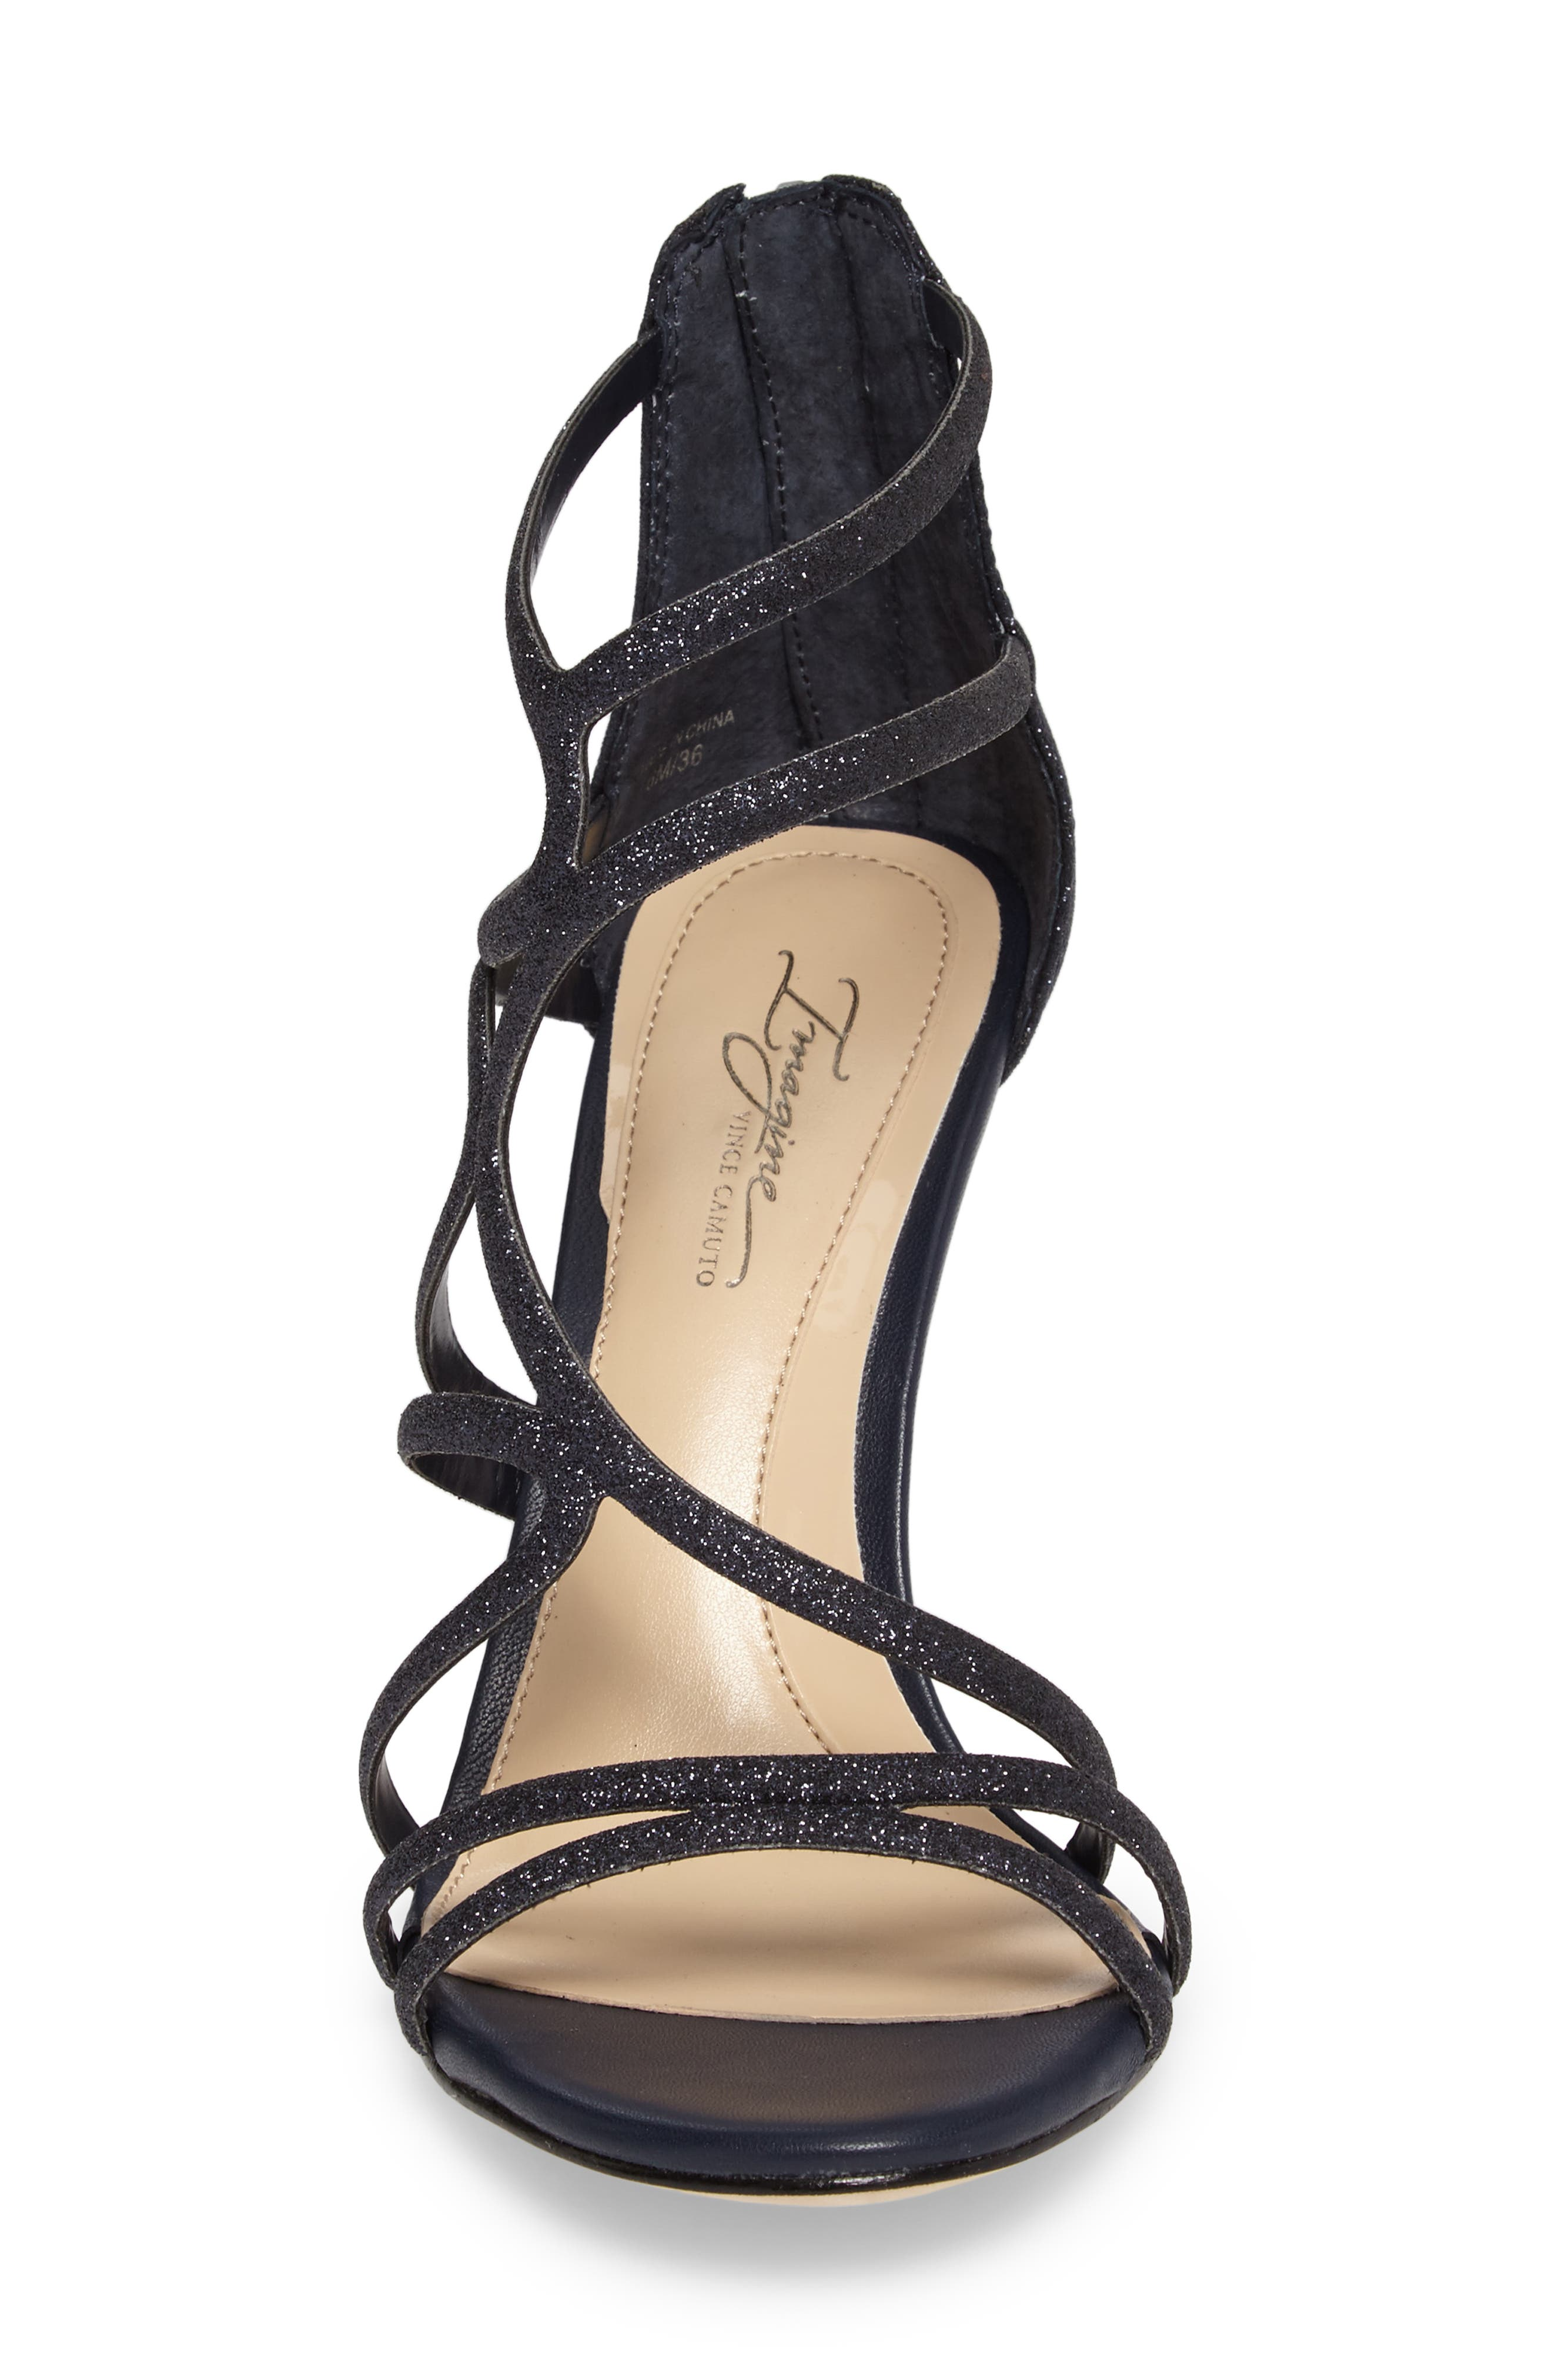 'Ranee' Dress Sandal,                             Alternate thumbnail 23, color,